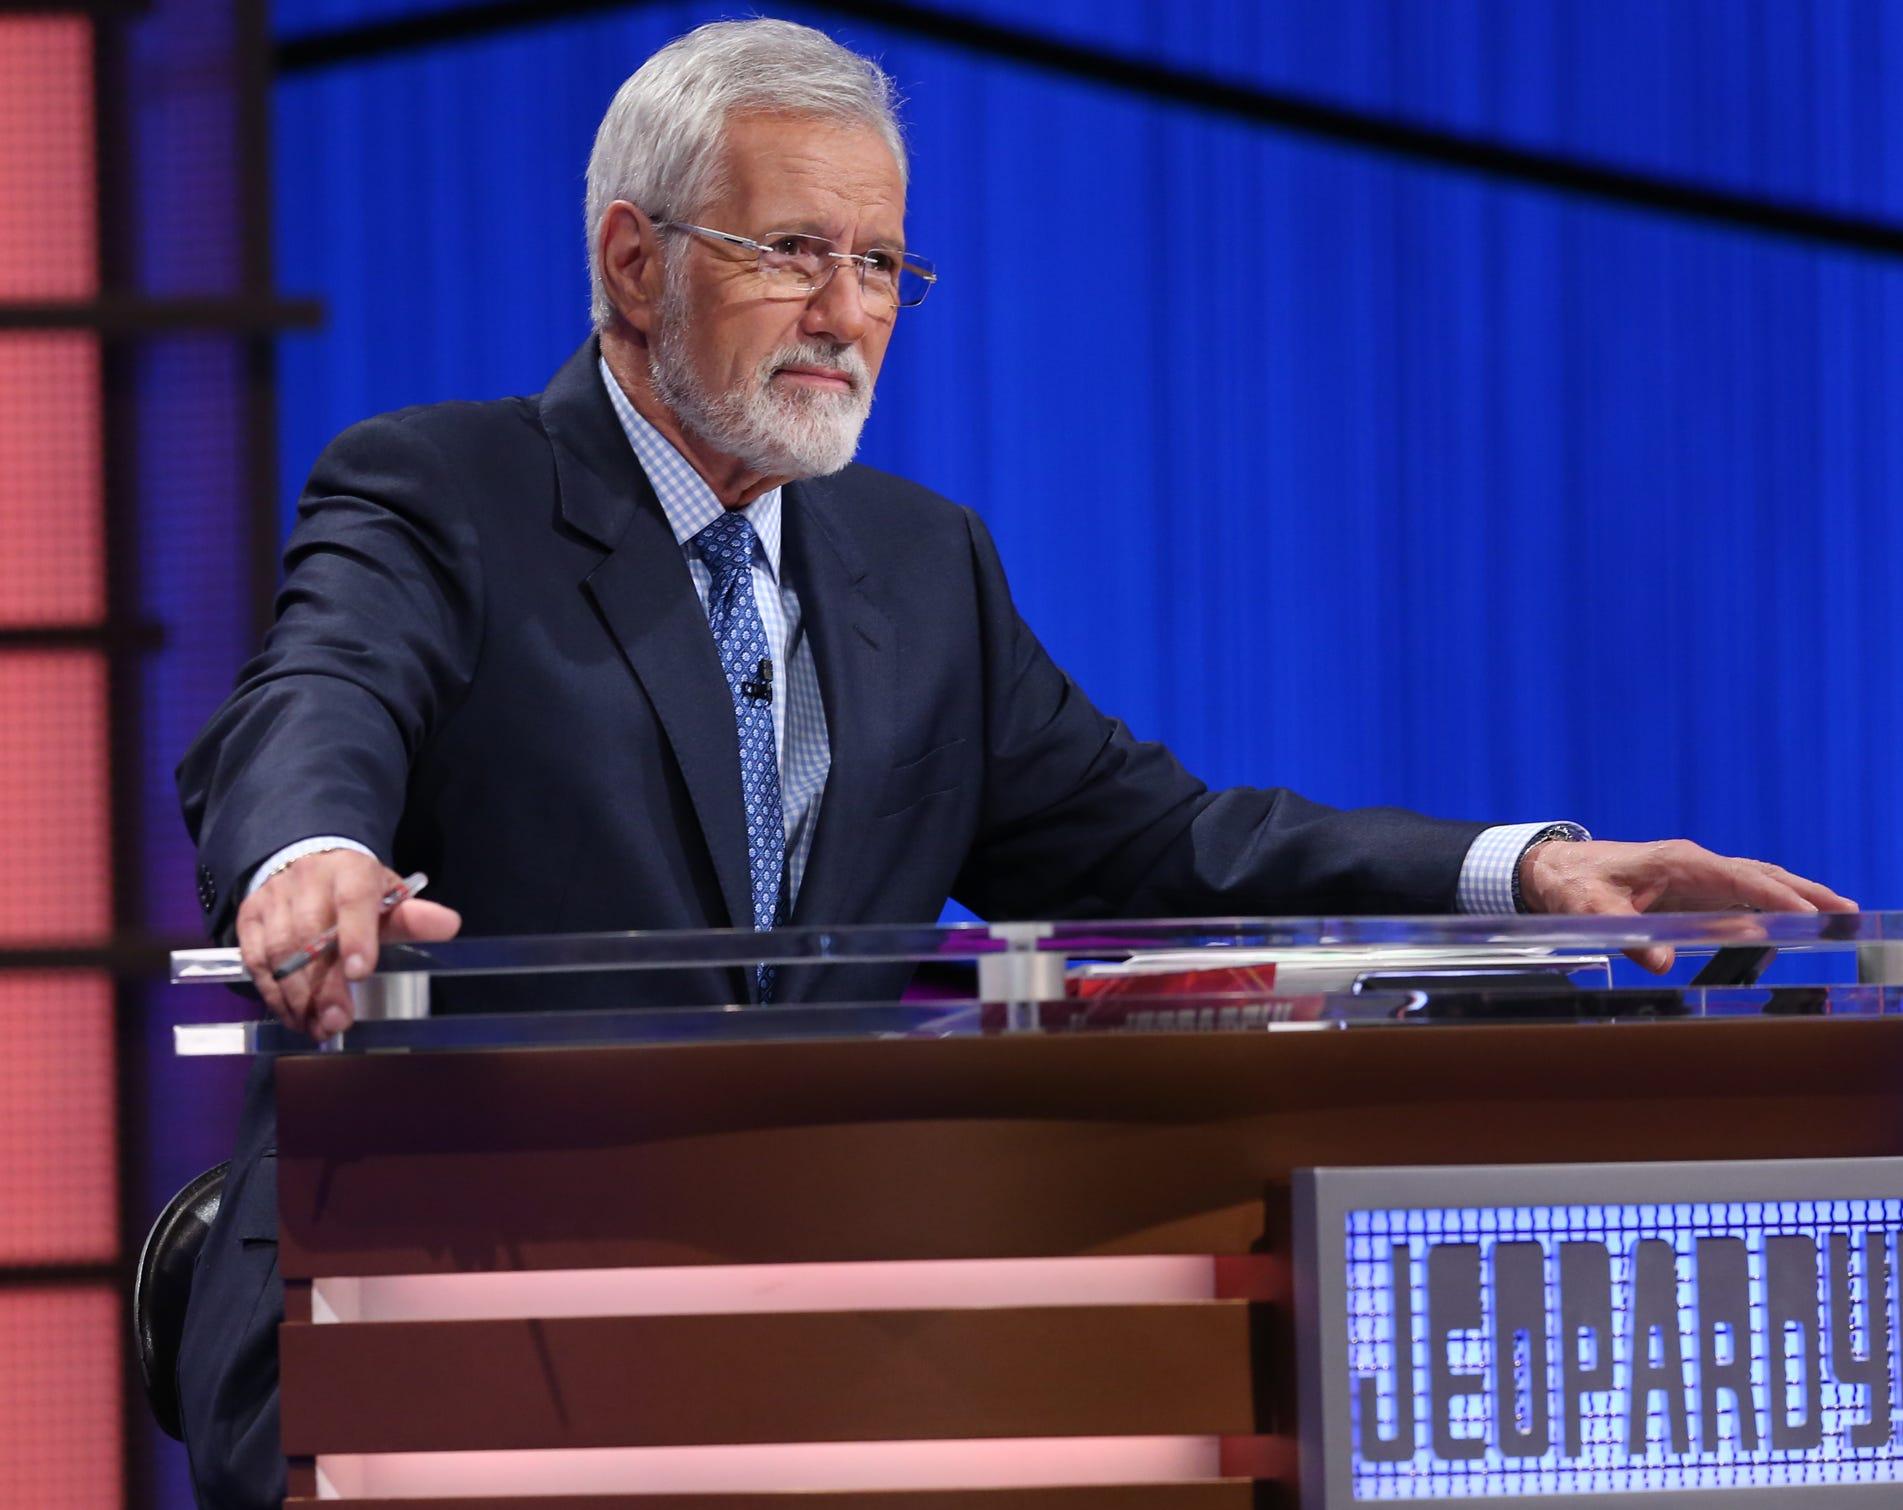 Alex Trebeck Jeopardy